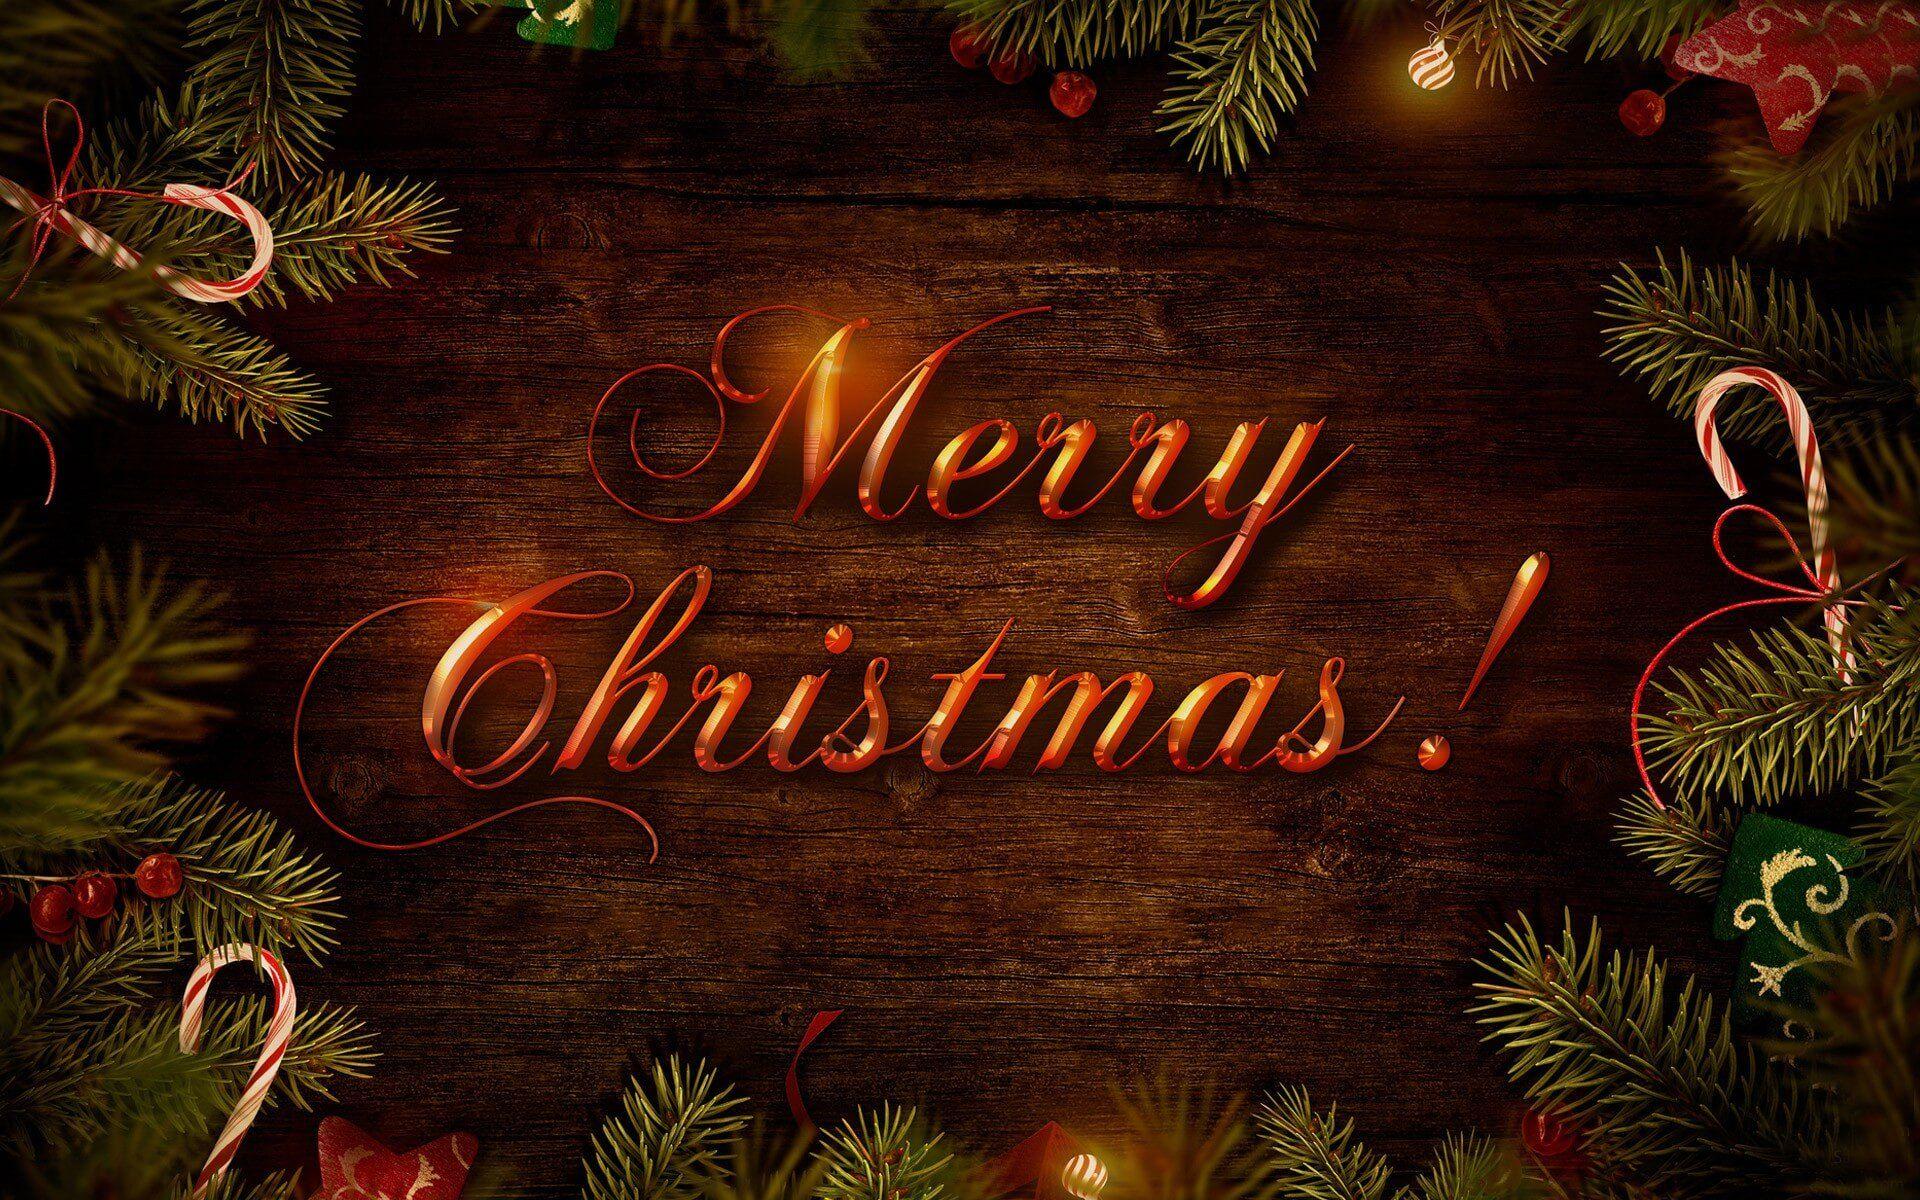 merry christmas wallpaper 2016